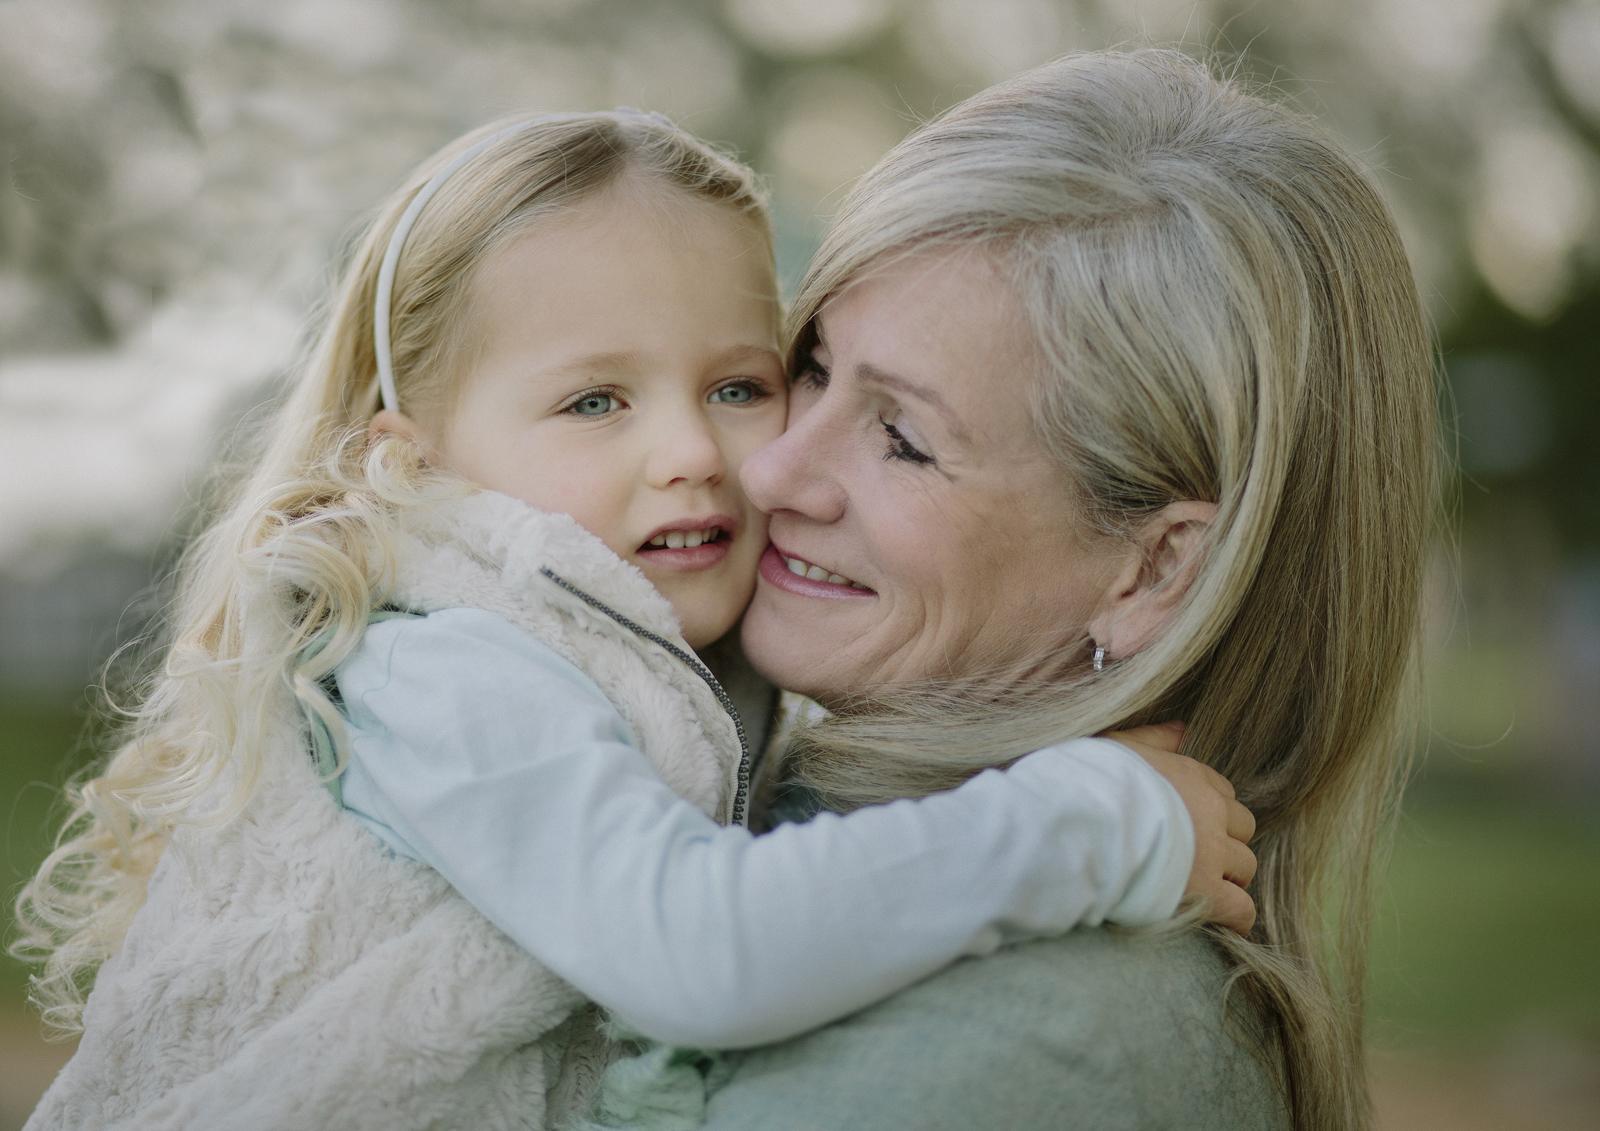 Mum & Daughter photo!